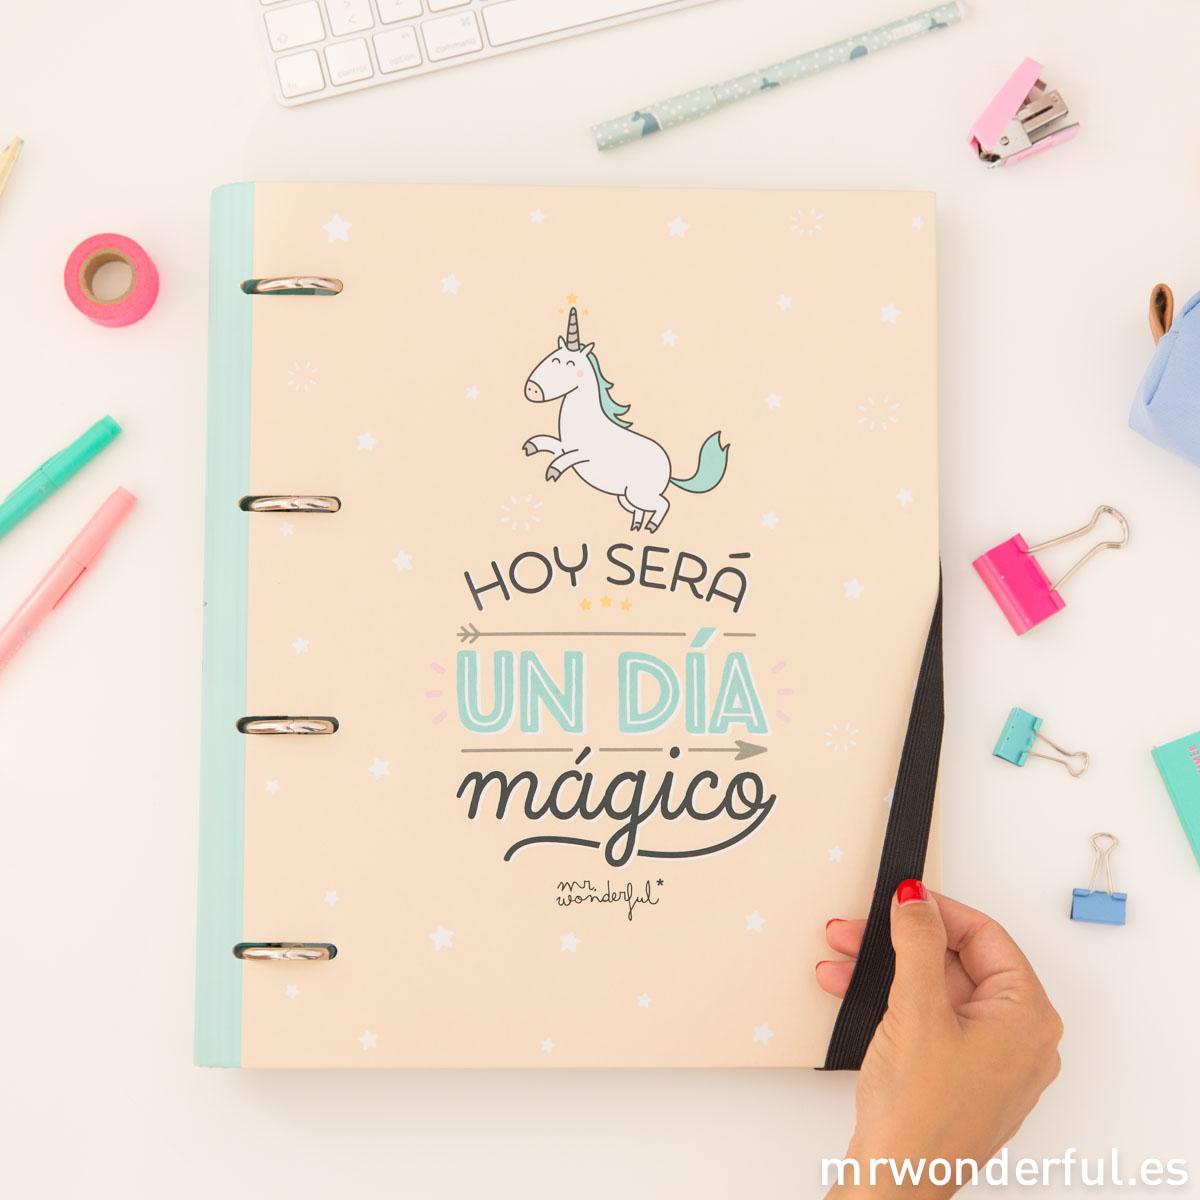 mrwonderful_8435460707312_WOA03707ES_carpeta-con-anillas_hoy-sera-un-dia-magico_CAST-10